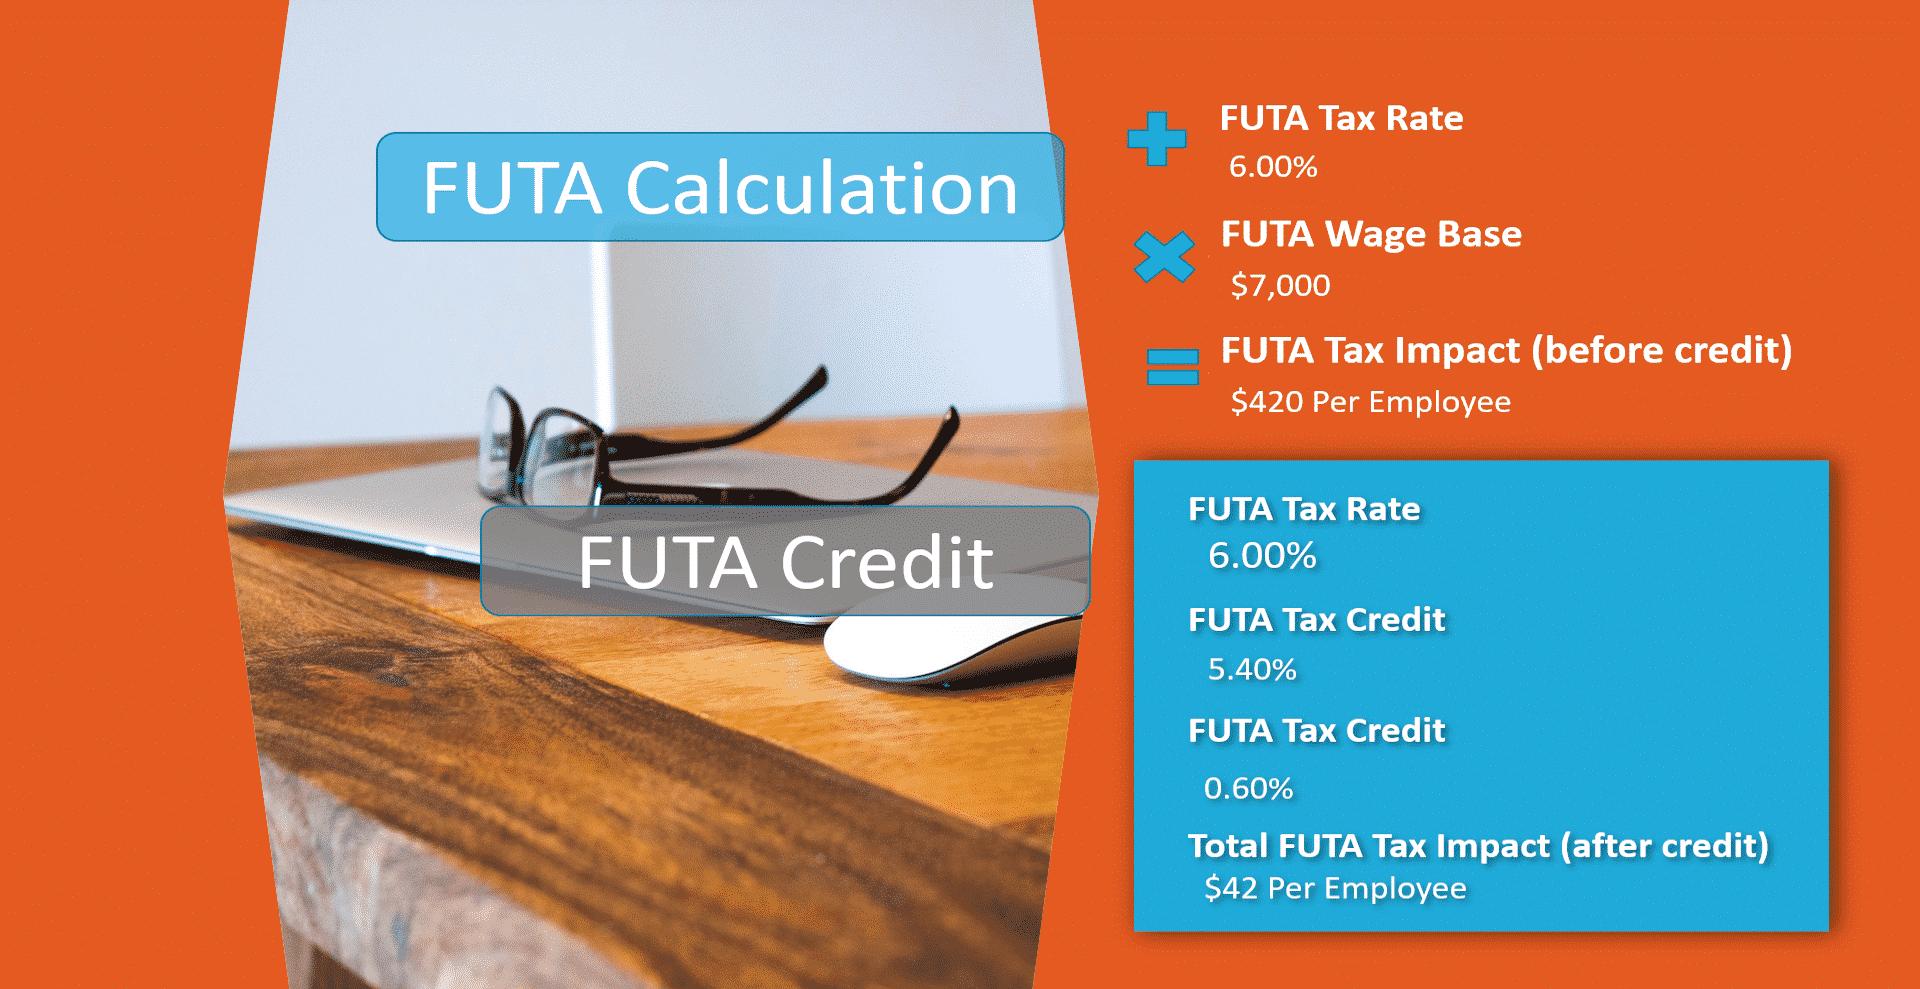 FUTA Tax Calculation